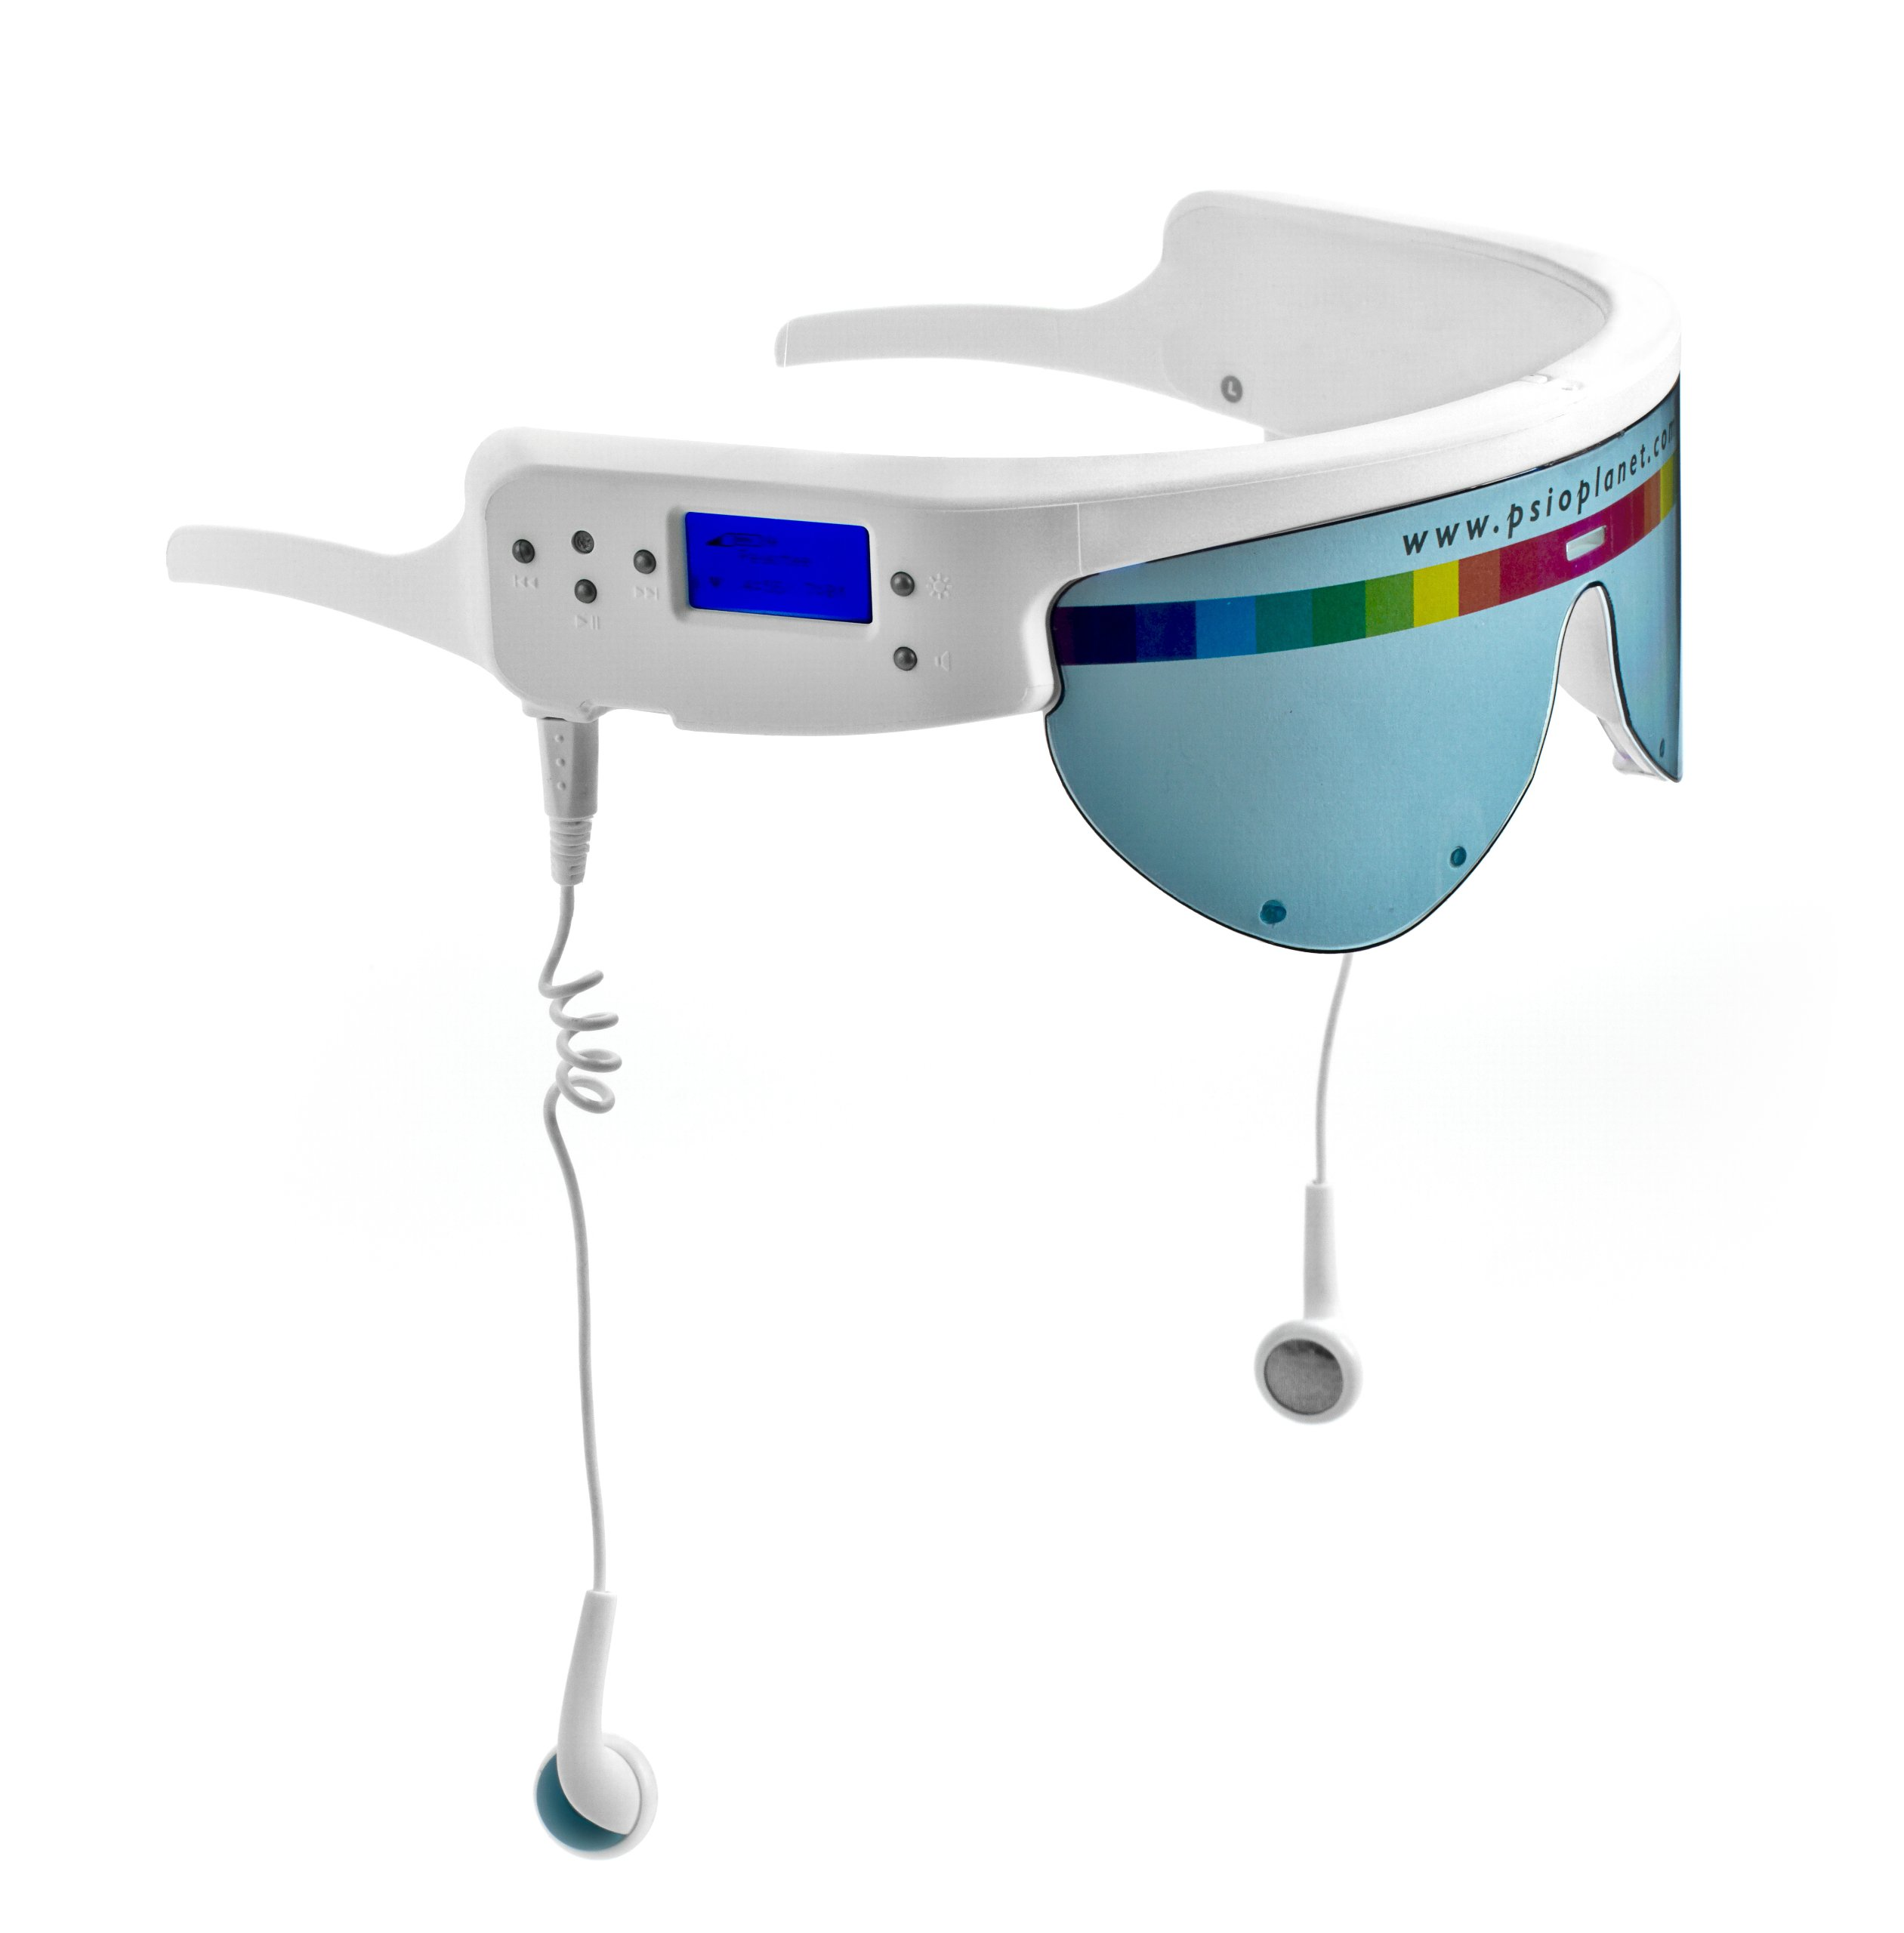 PSIO 1.1 Audio and Visual Mind Stimulator